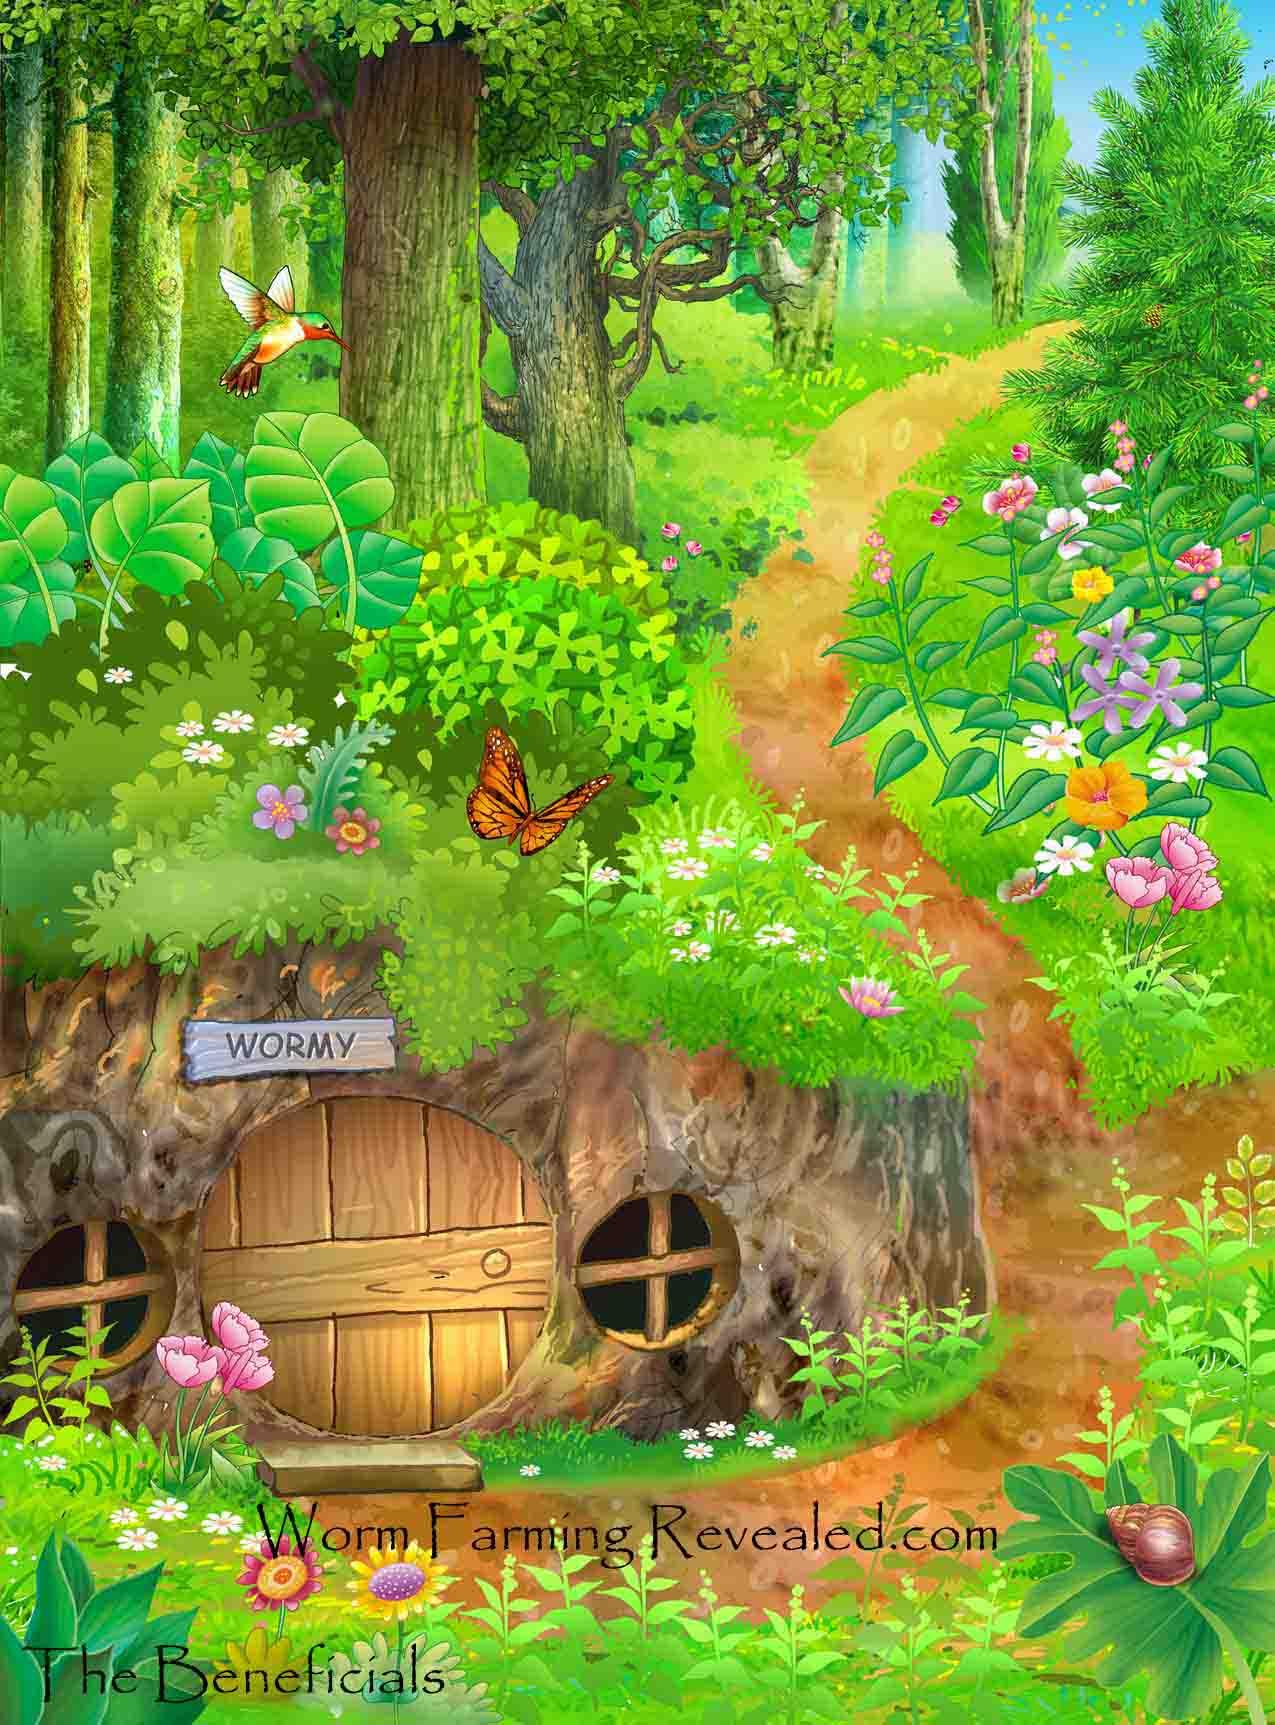 The Beneficials Hermi's Home